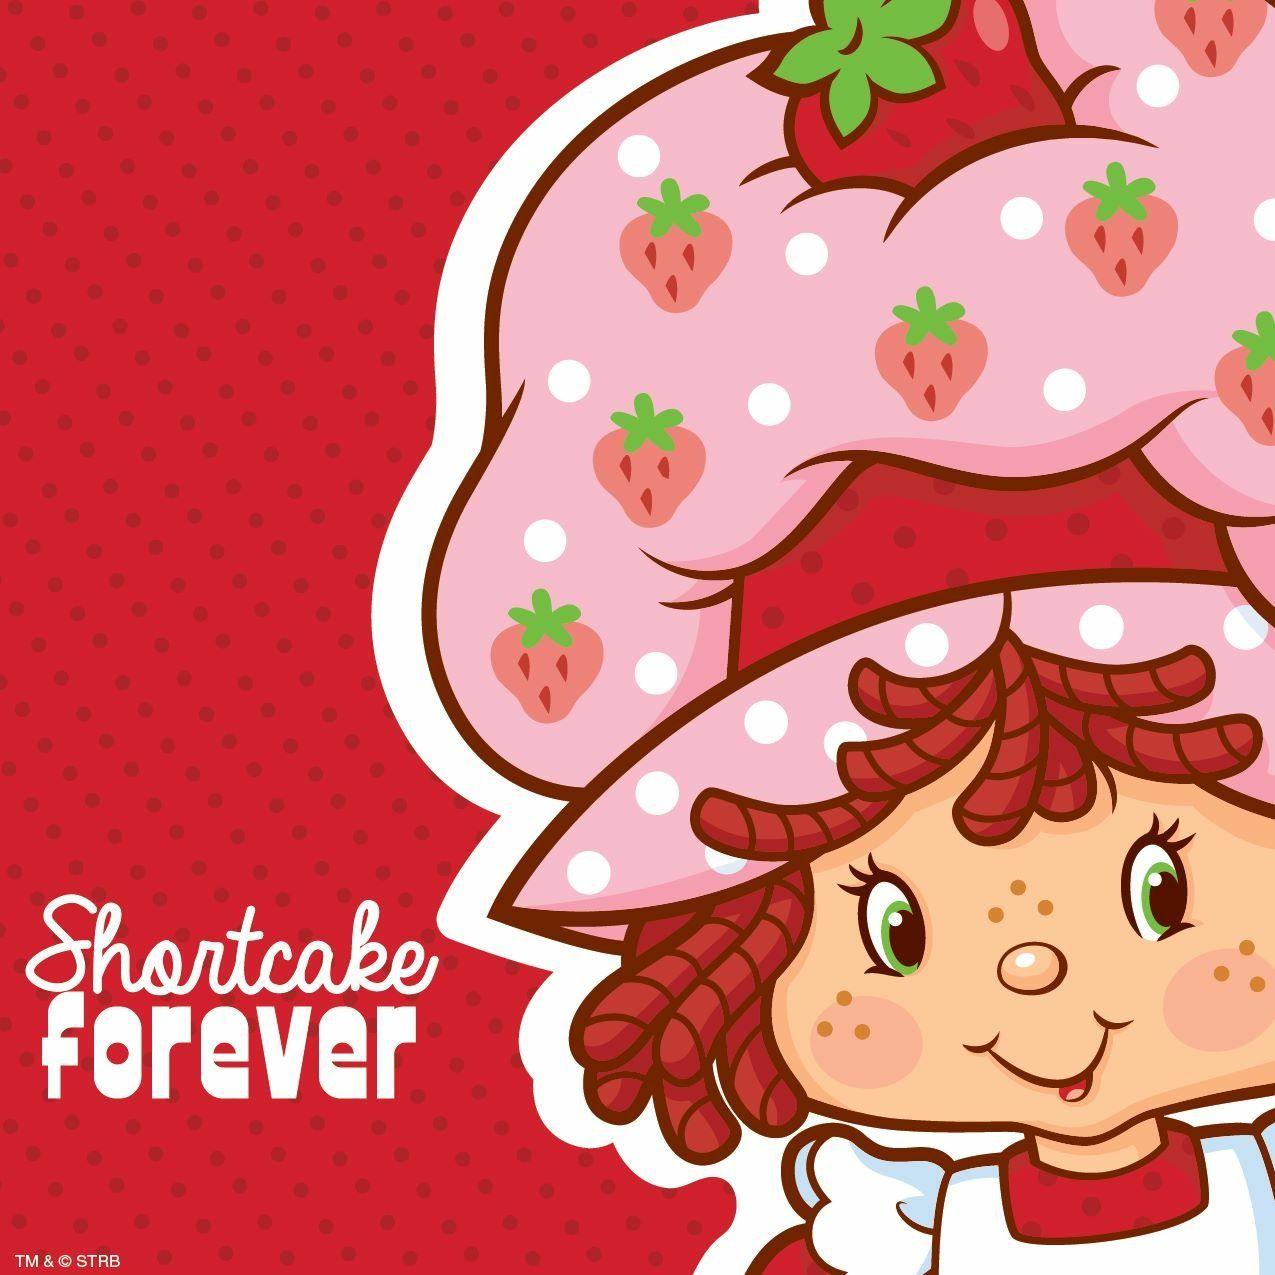 Pin de Emily Sasser en Vintage strawberry cake   Pinterest   Rosas y ...